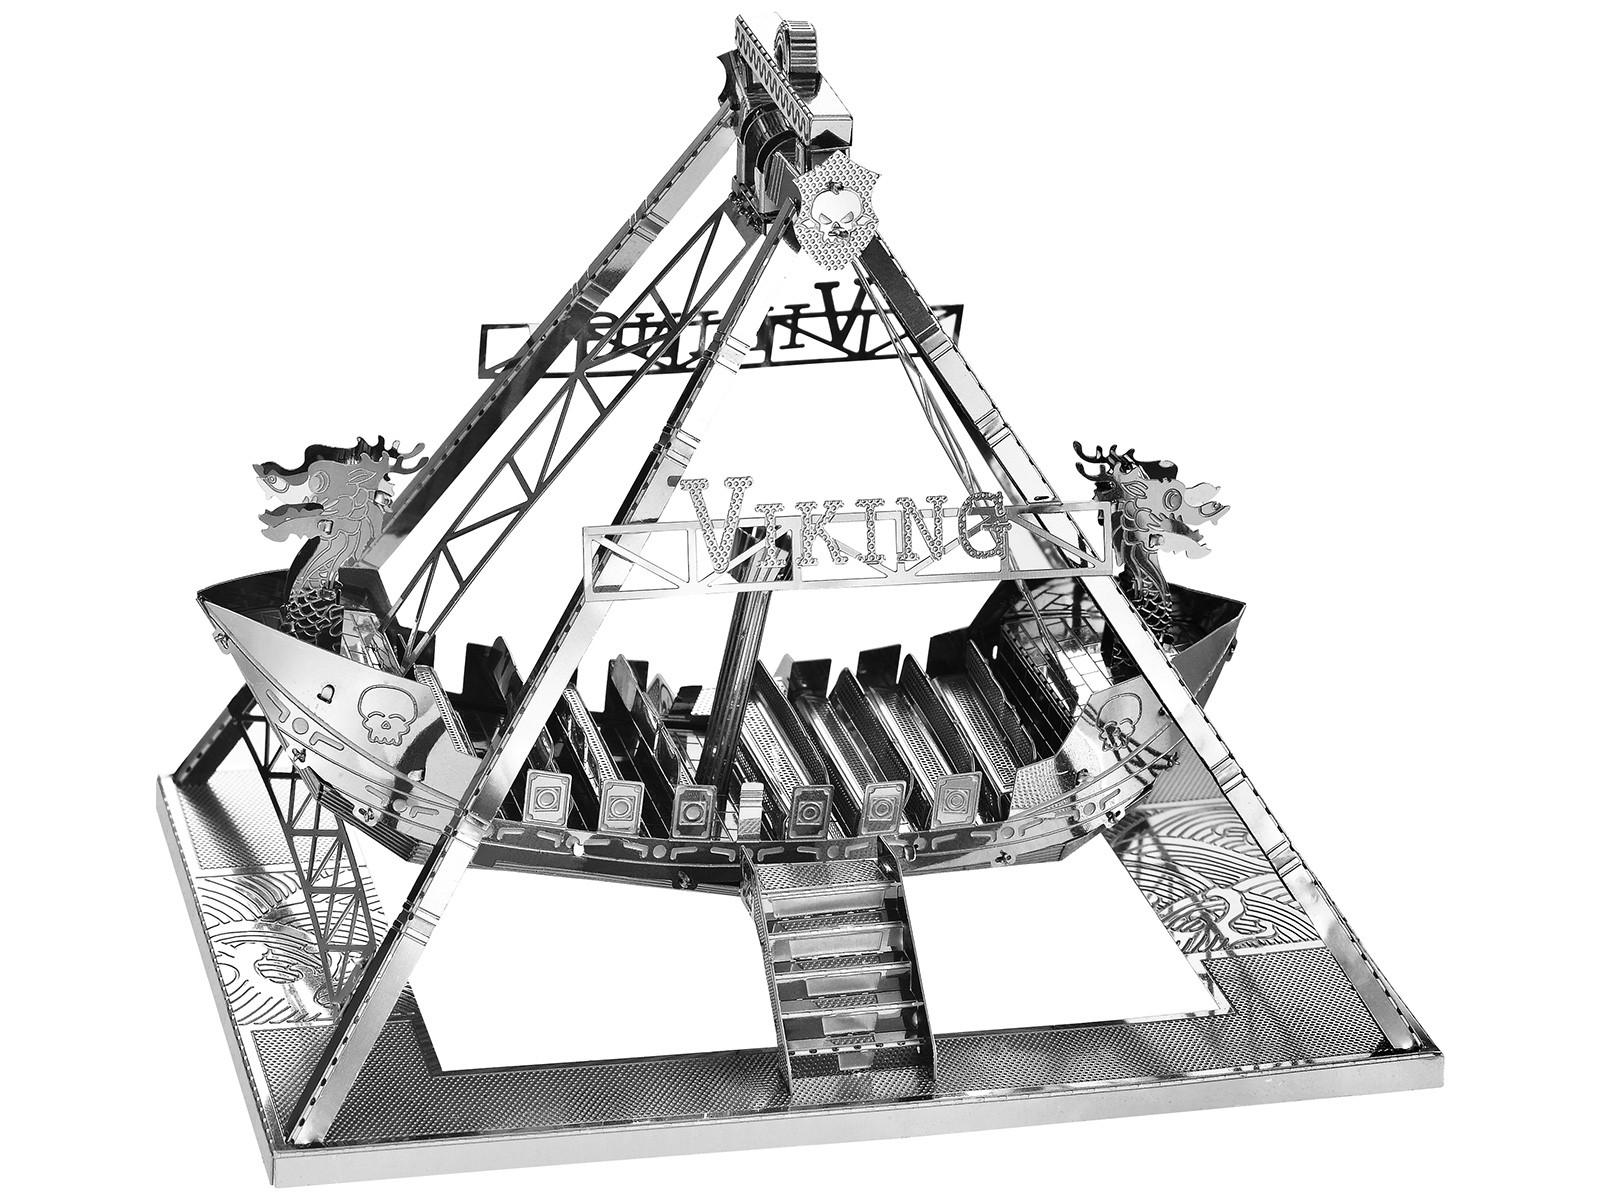 Mini-Metallbausatz Schiffschaukel